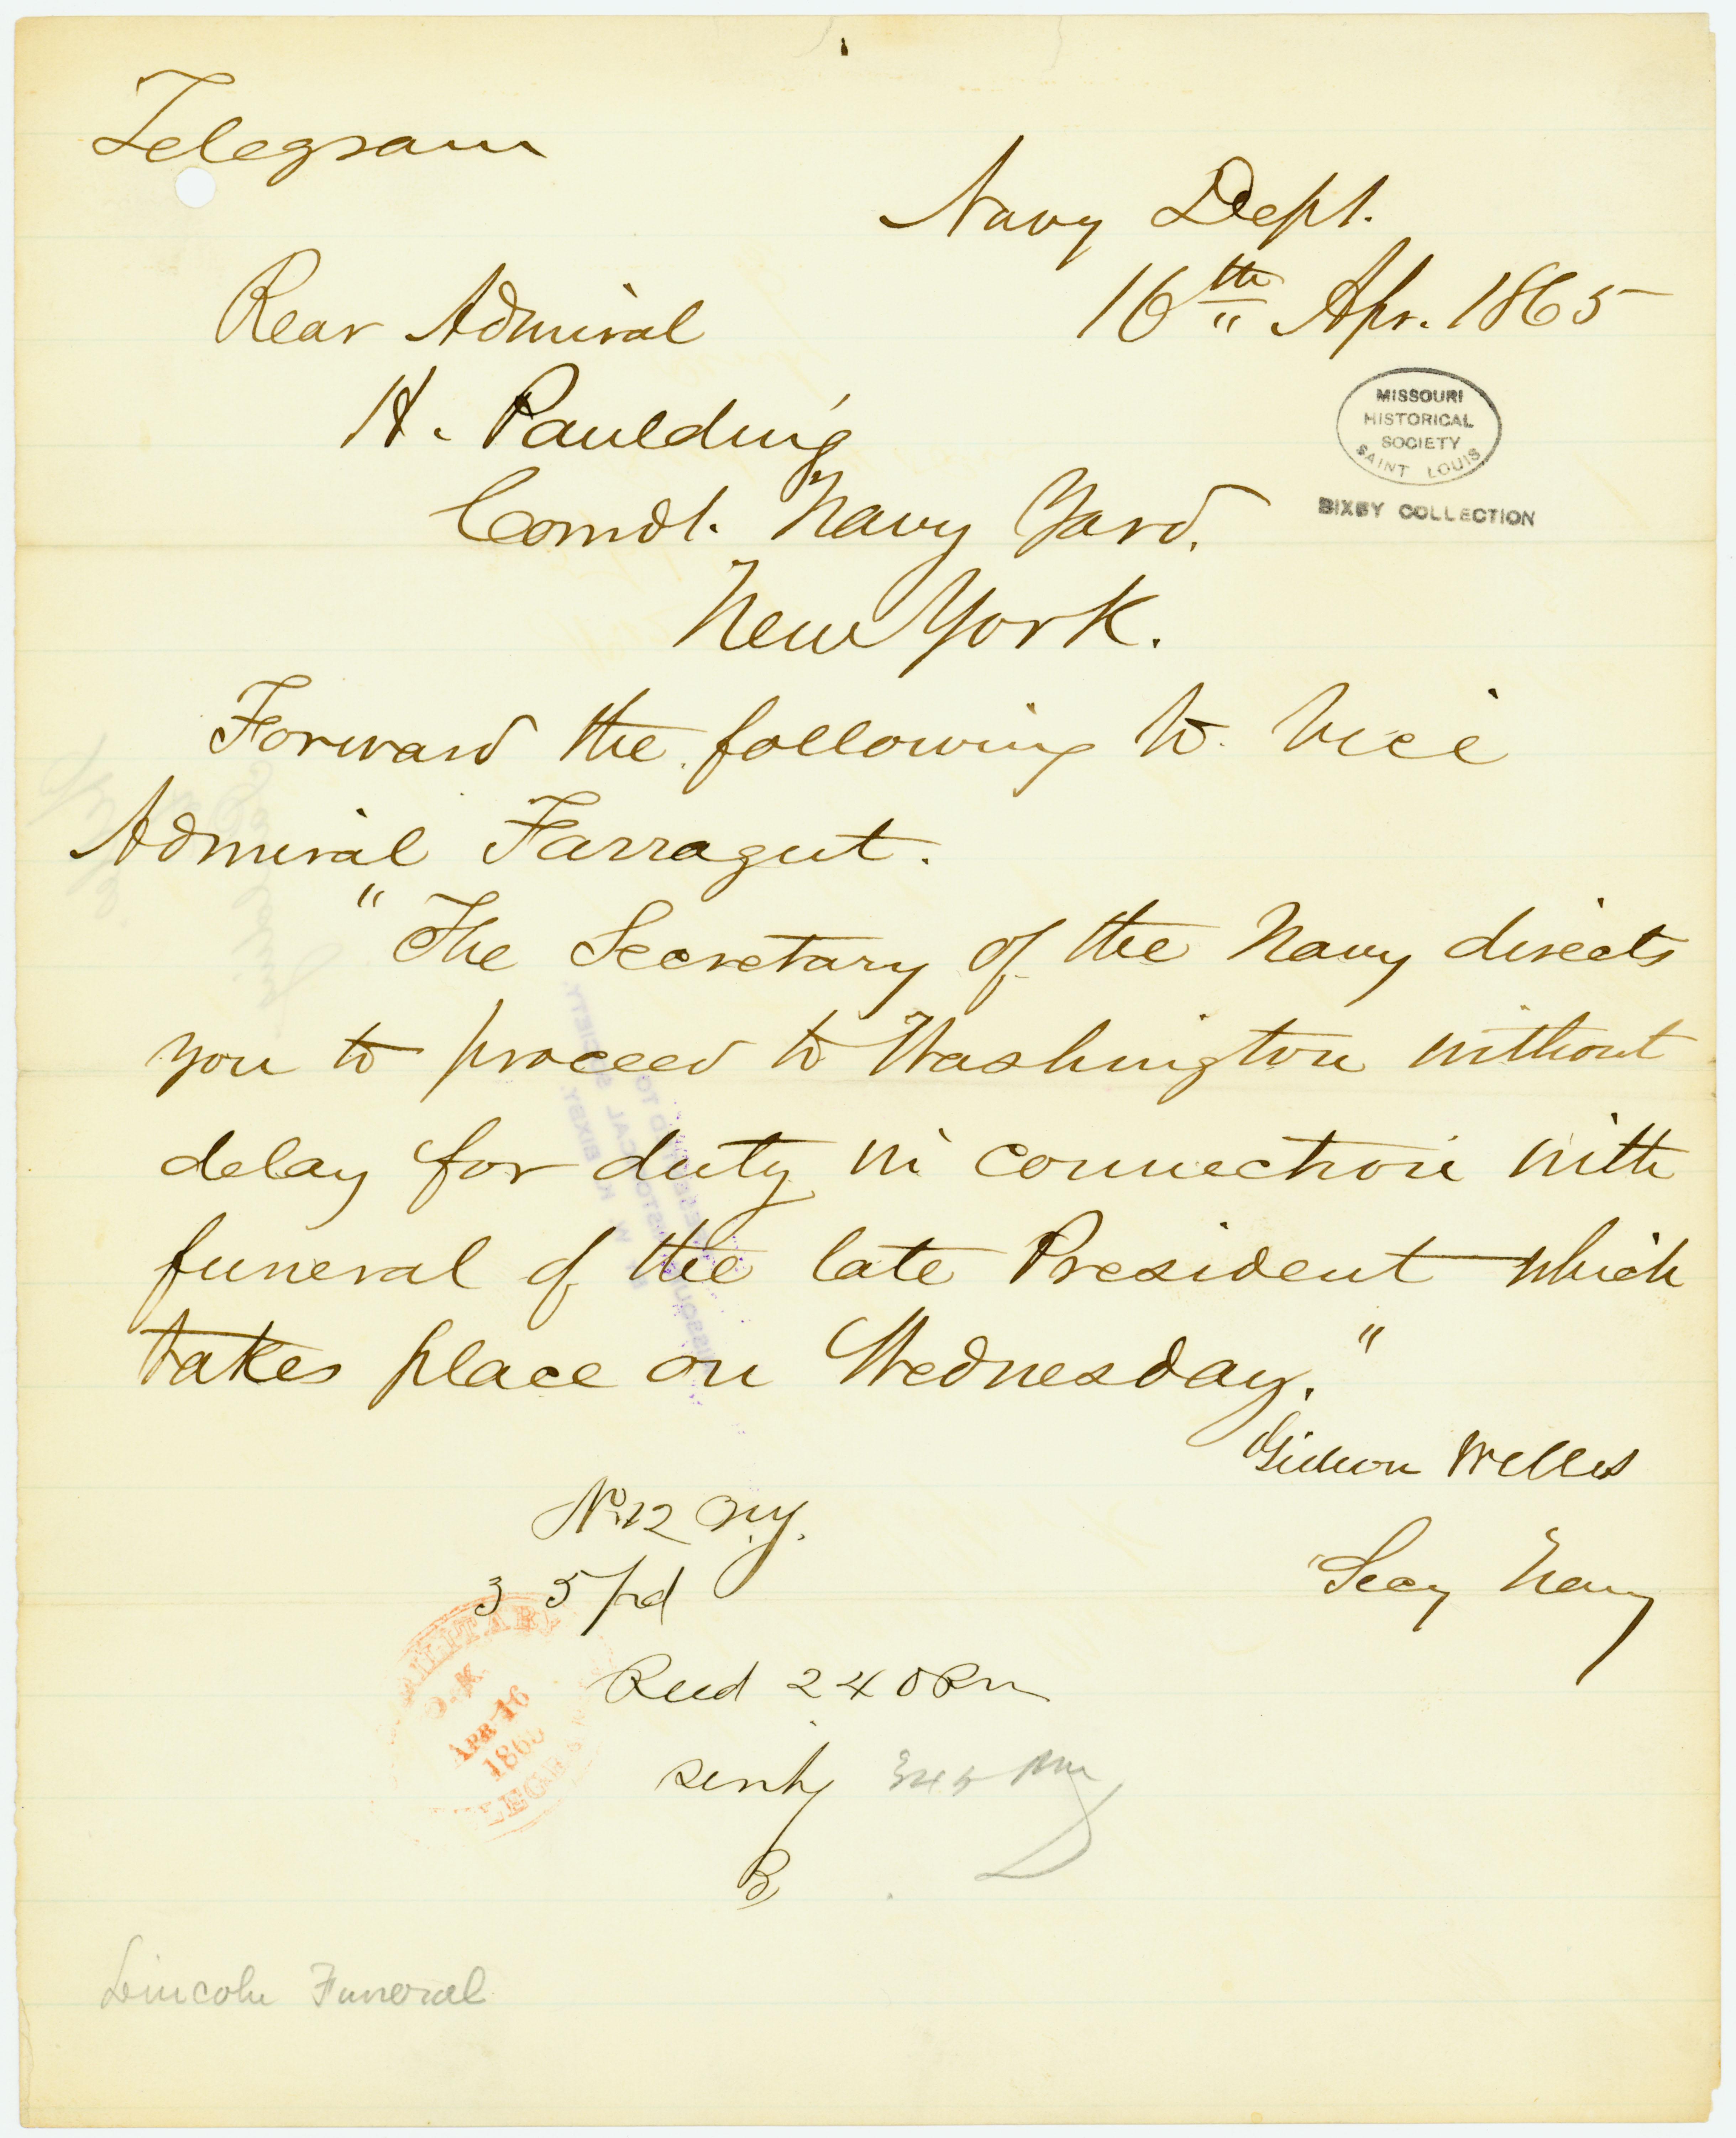 Telegram of Gideon Welles, Secy. Navy, Navy Dept., to Rear Admiral H. Paulding, Comdt. Navy Yard, New York, April 16, 1865